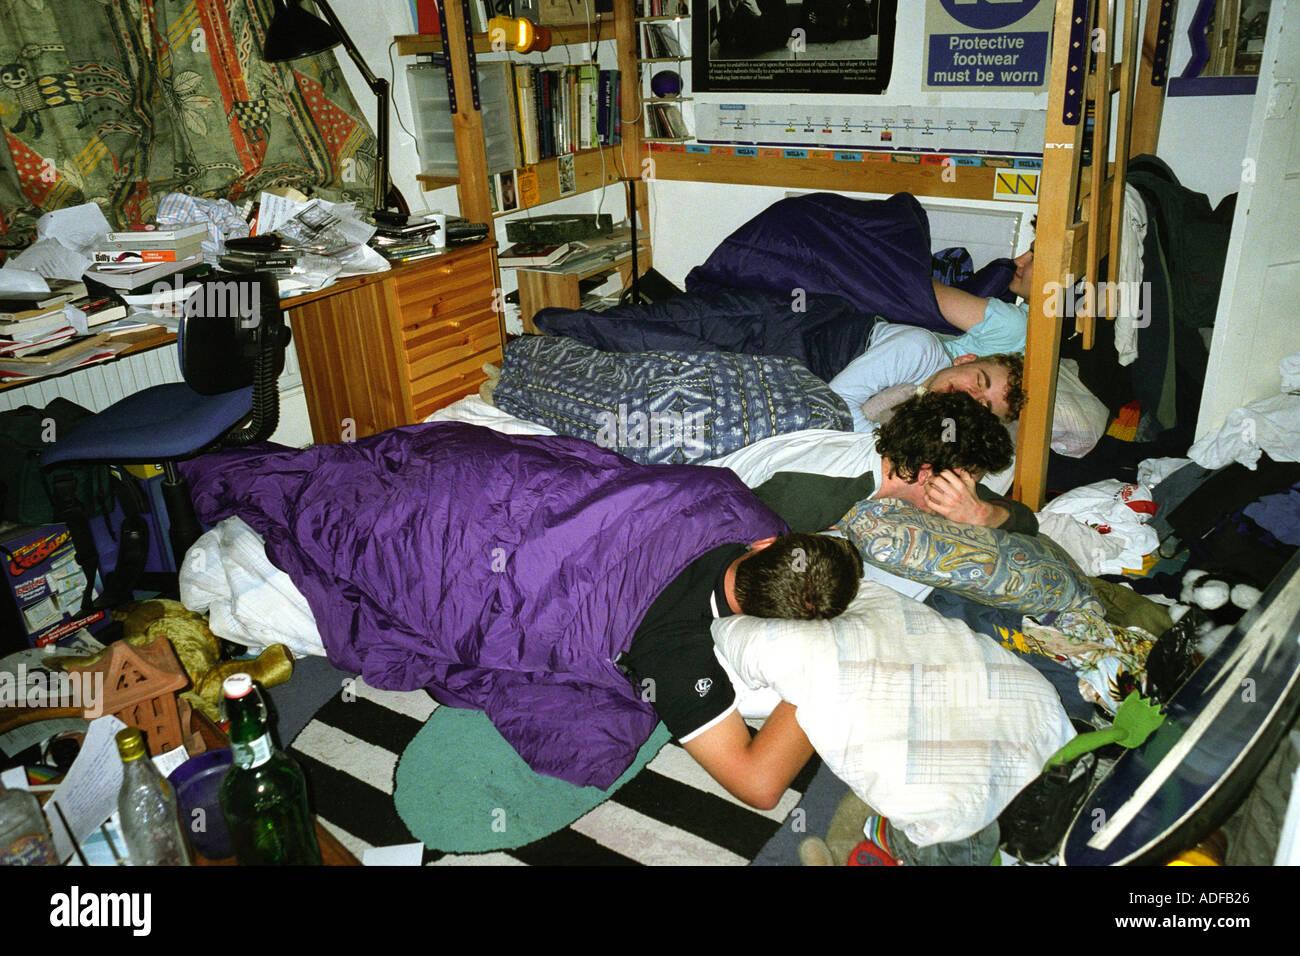 sleep over floor friends stock photos sleep over floor friends